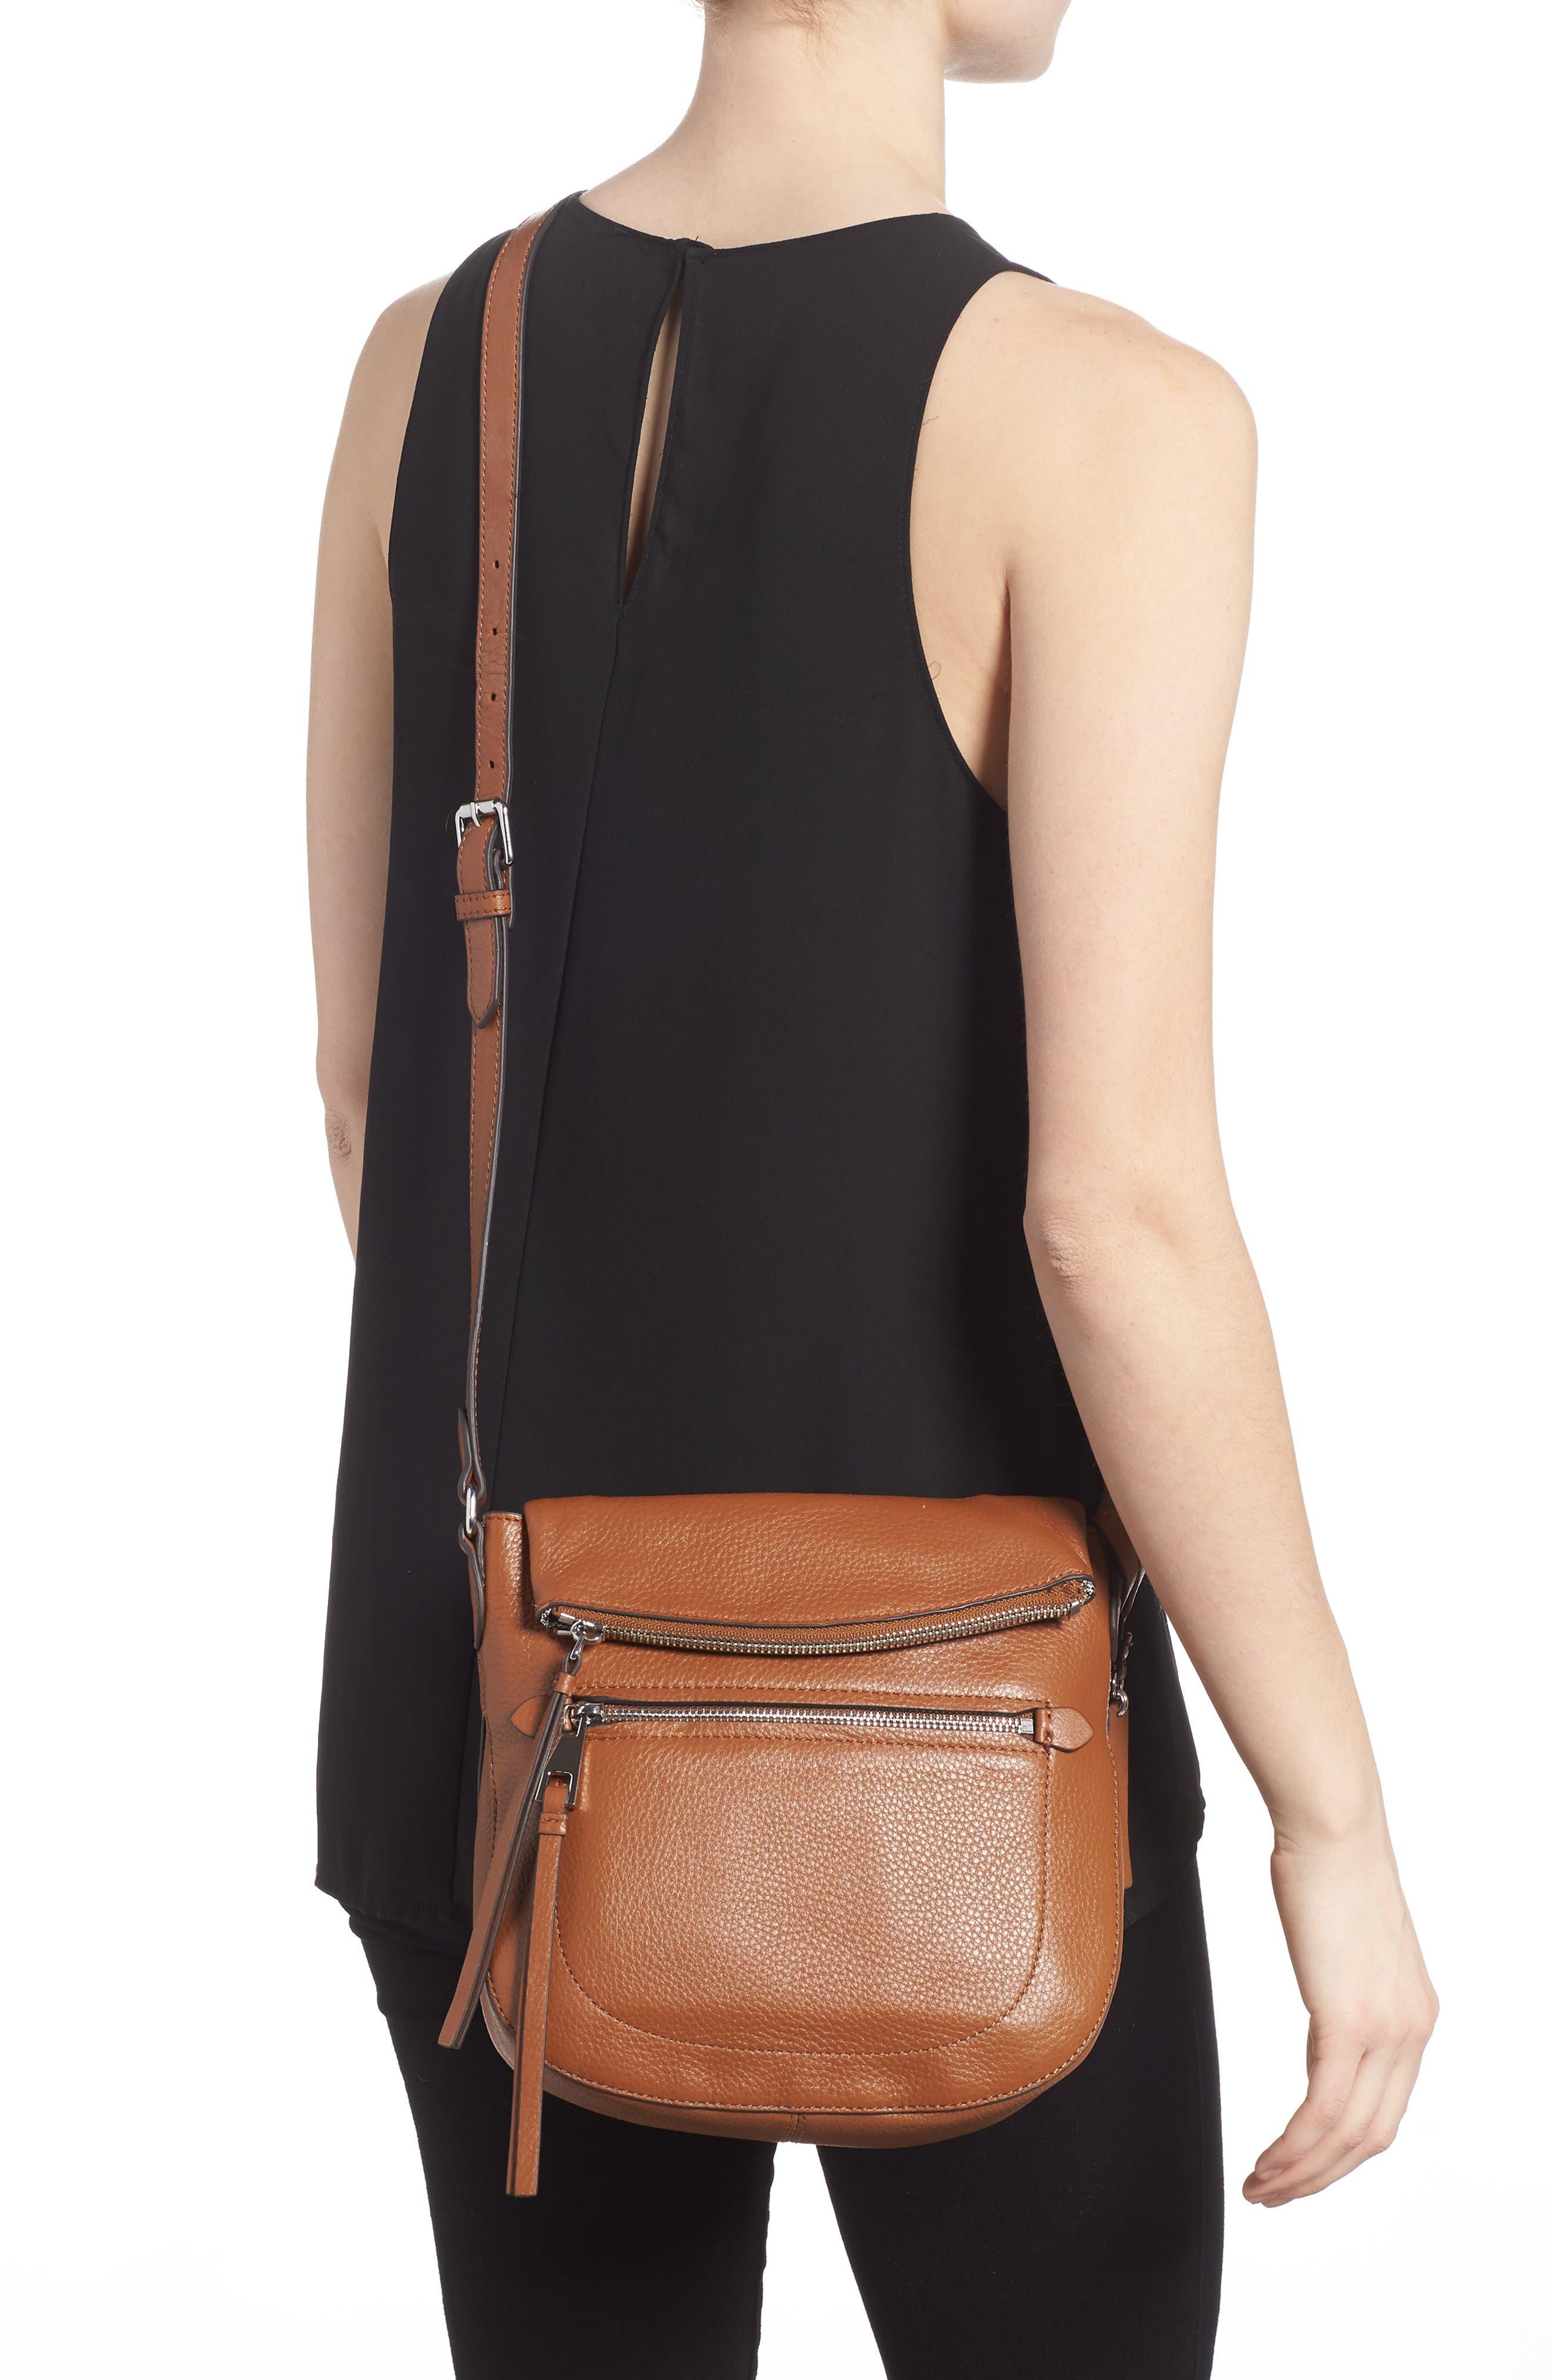 'Tala' Leather Crossbody Bag,                             Alternate thumbnail 2, color,                             203